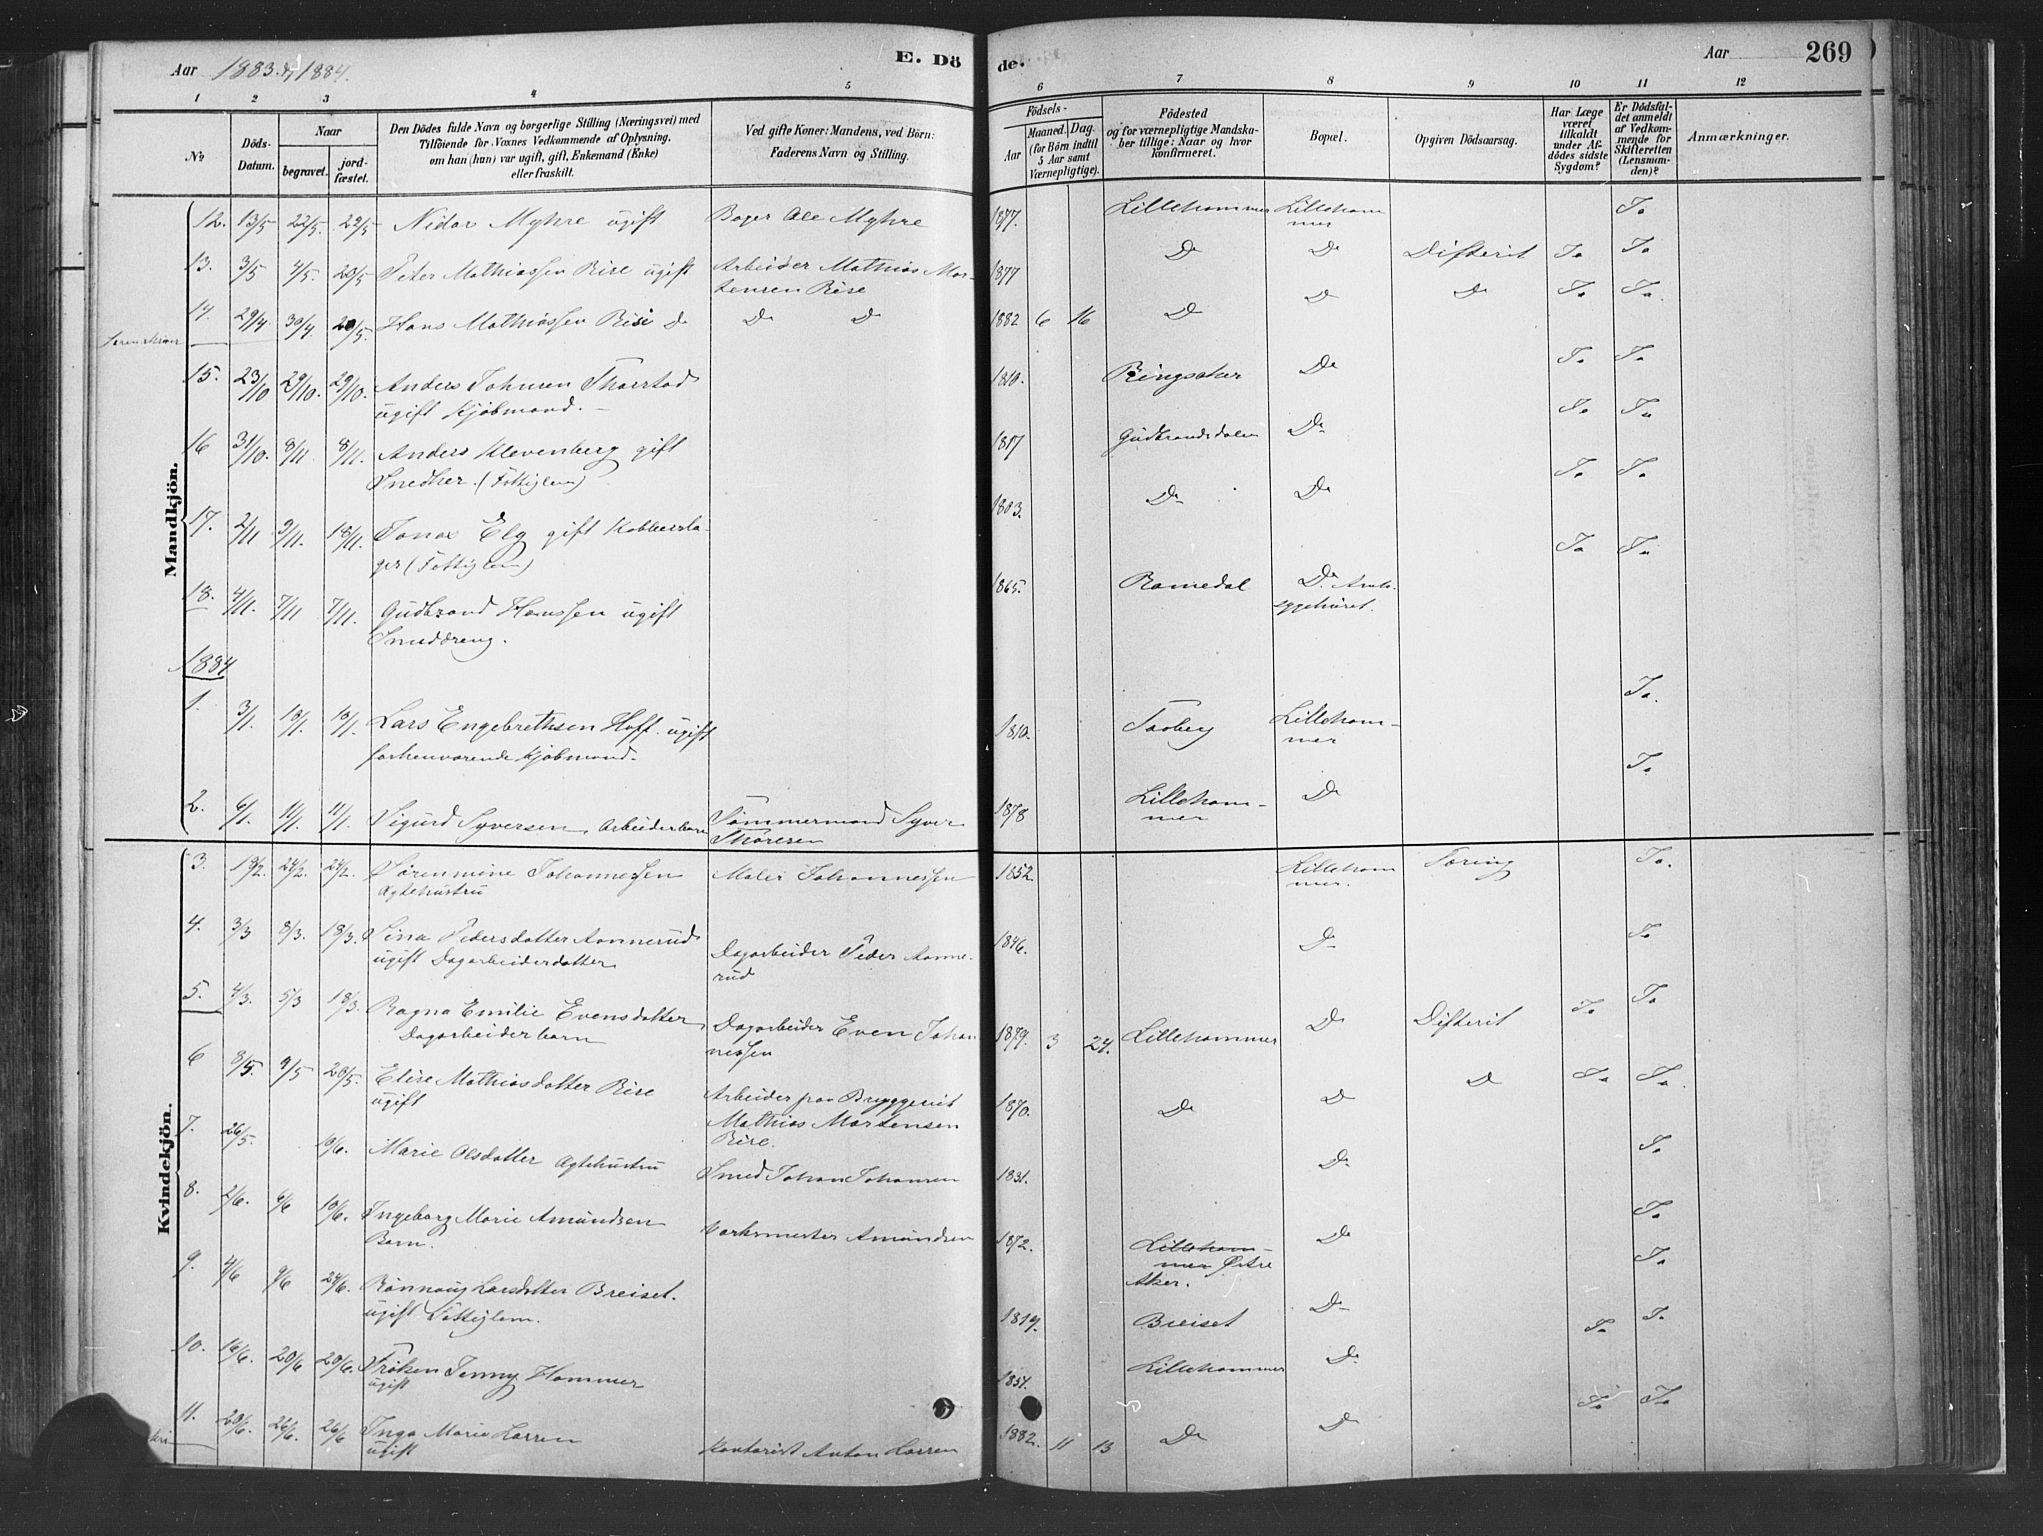 SAH, Fåberg prestekontor, Ministerialbok nr. 10, 1879-1900, s. 269